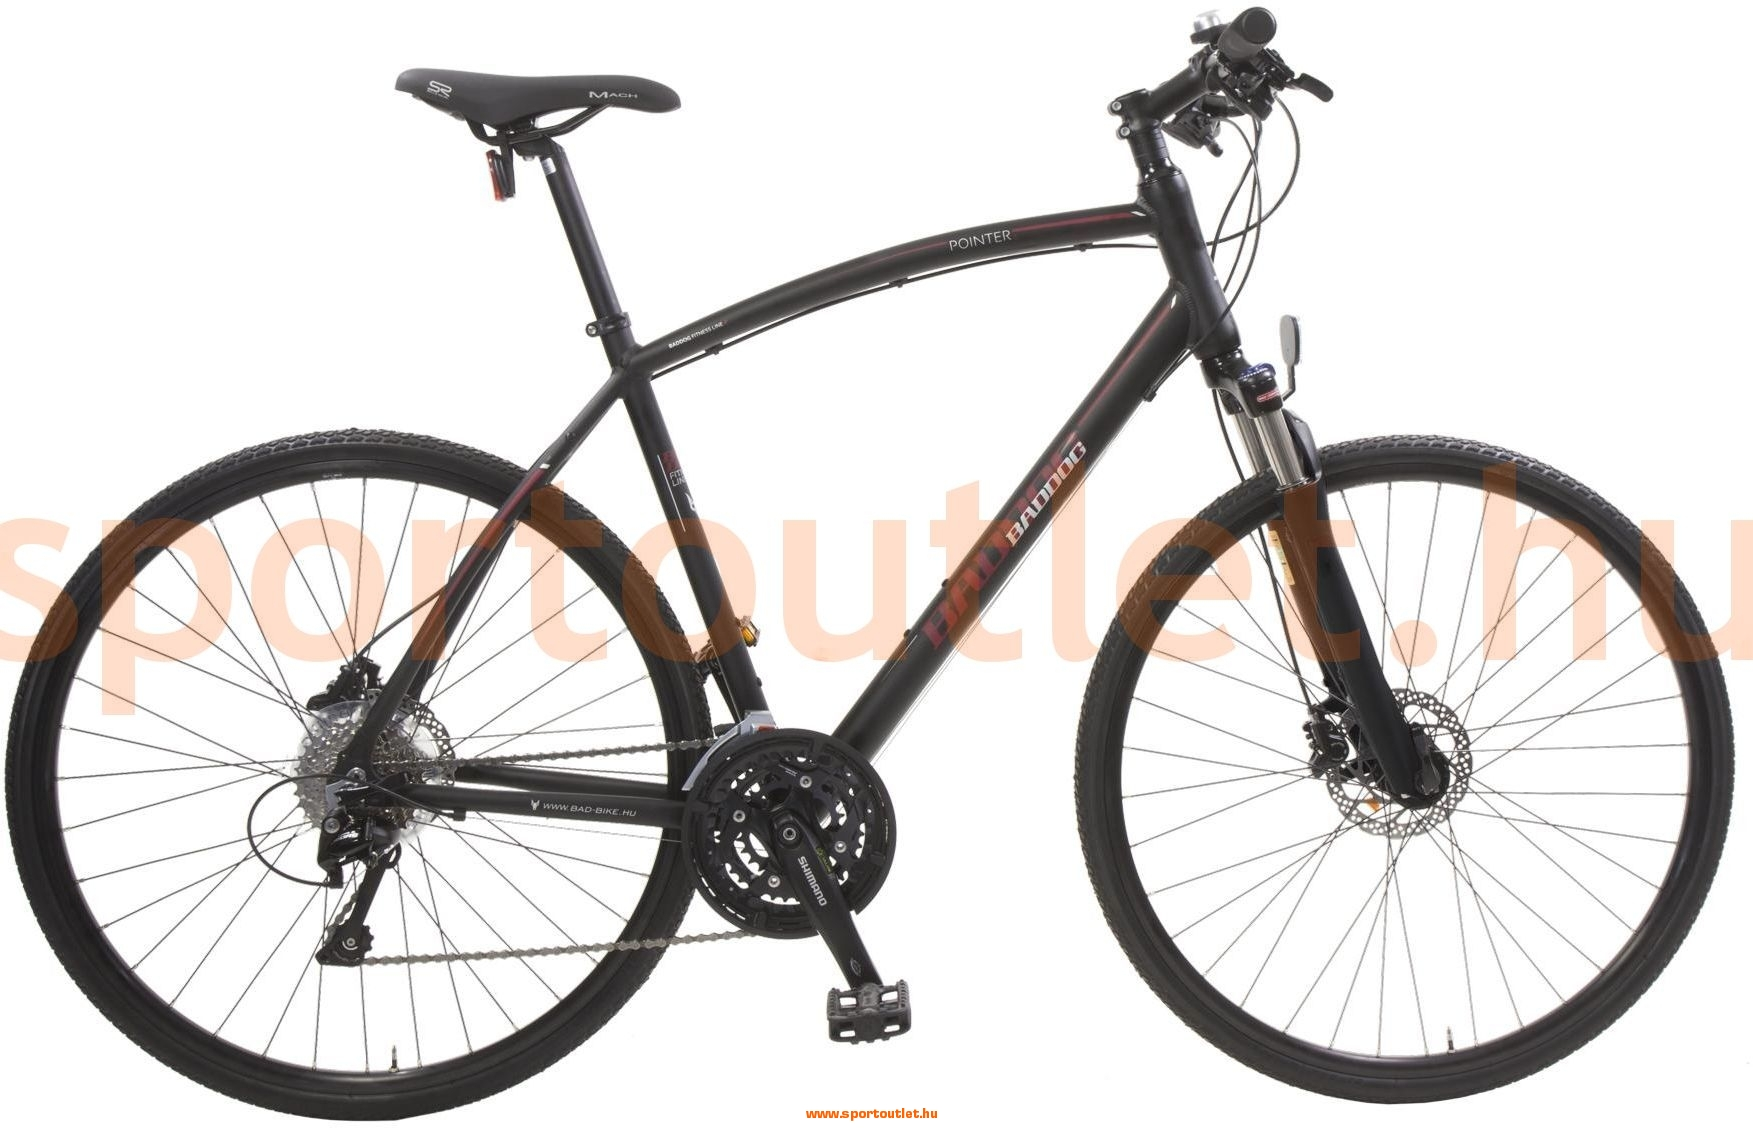 Baddog Pointer S kerékpár